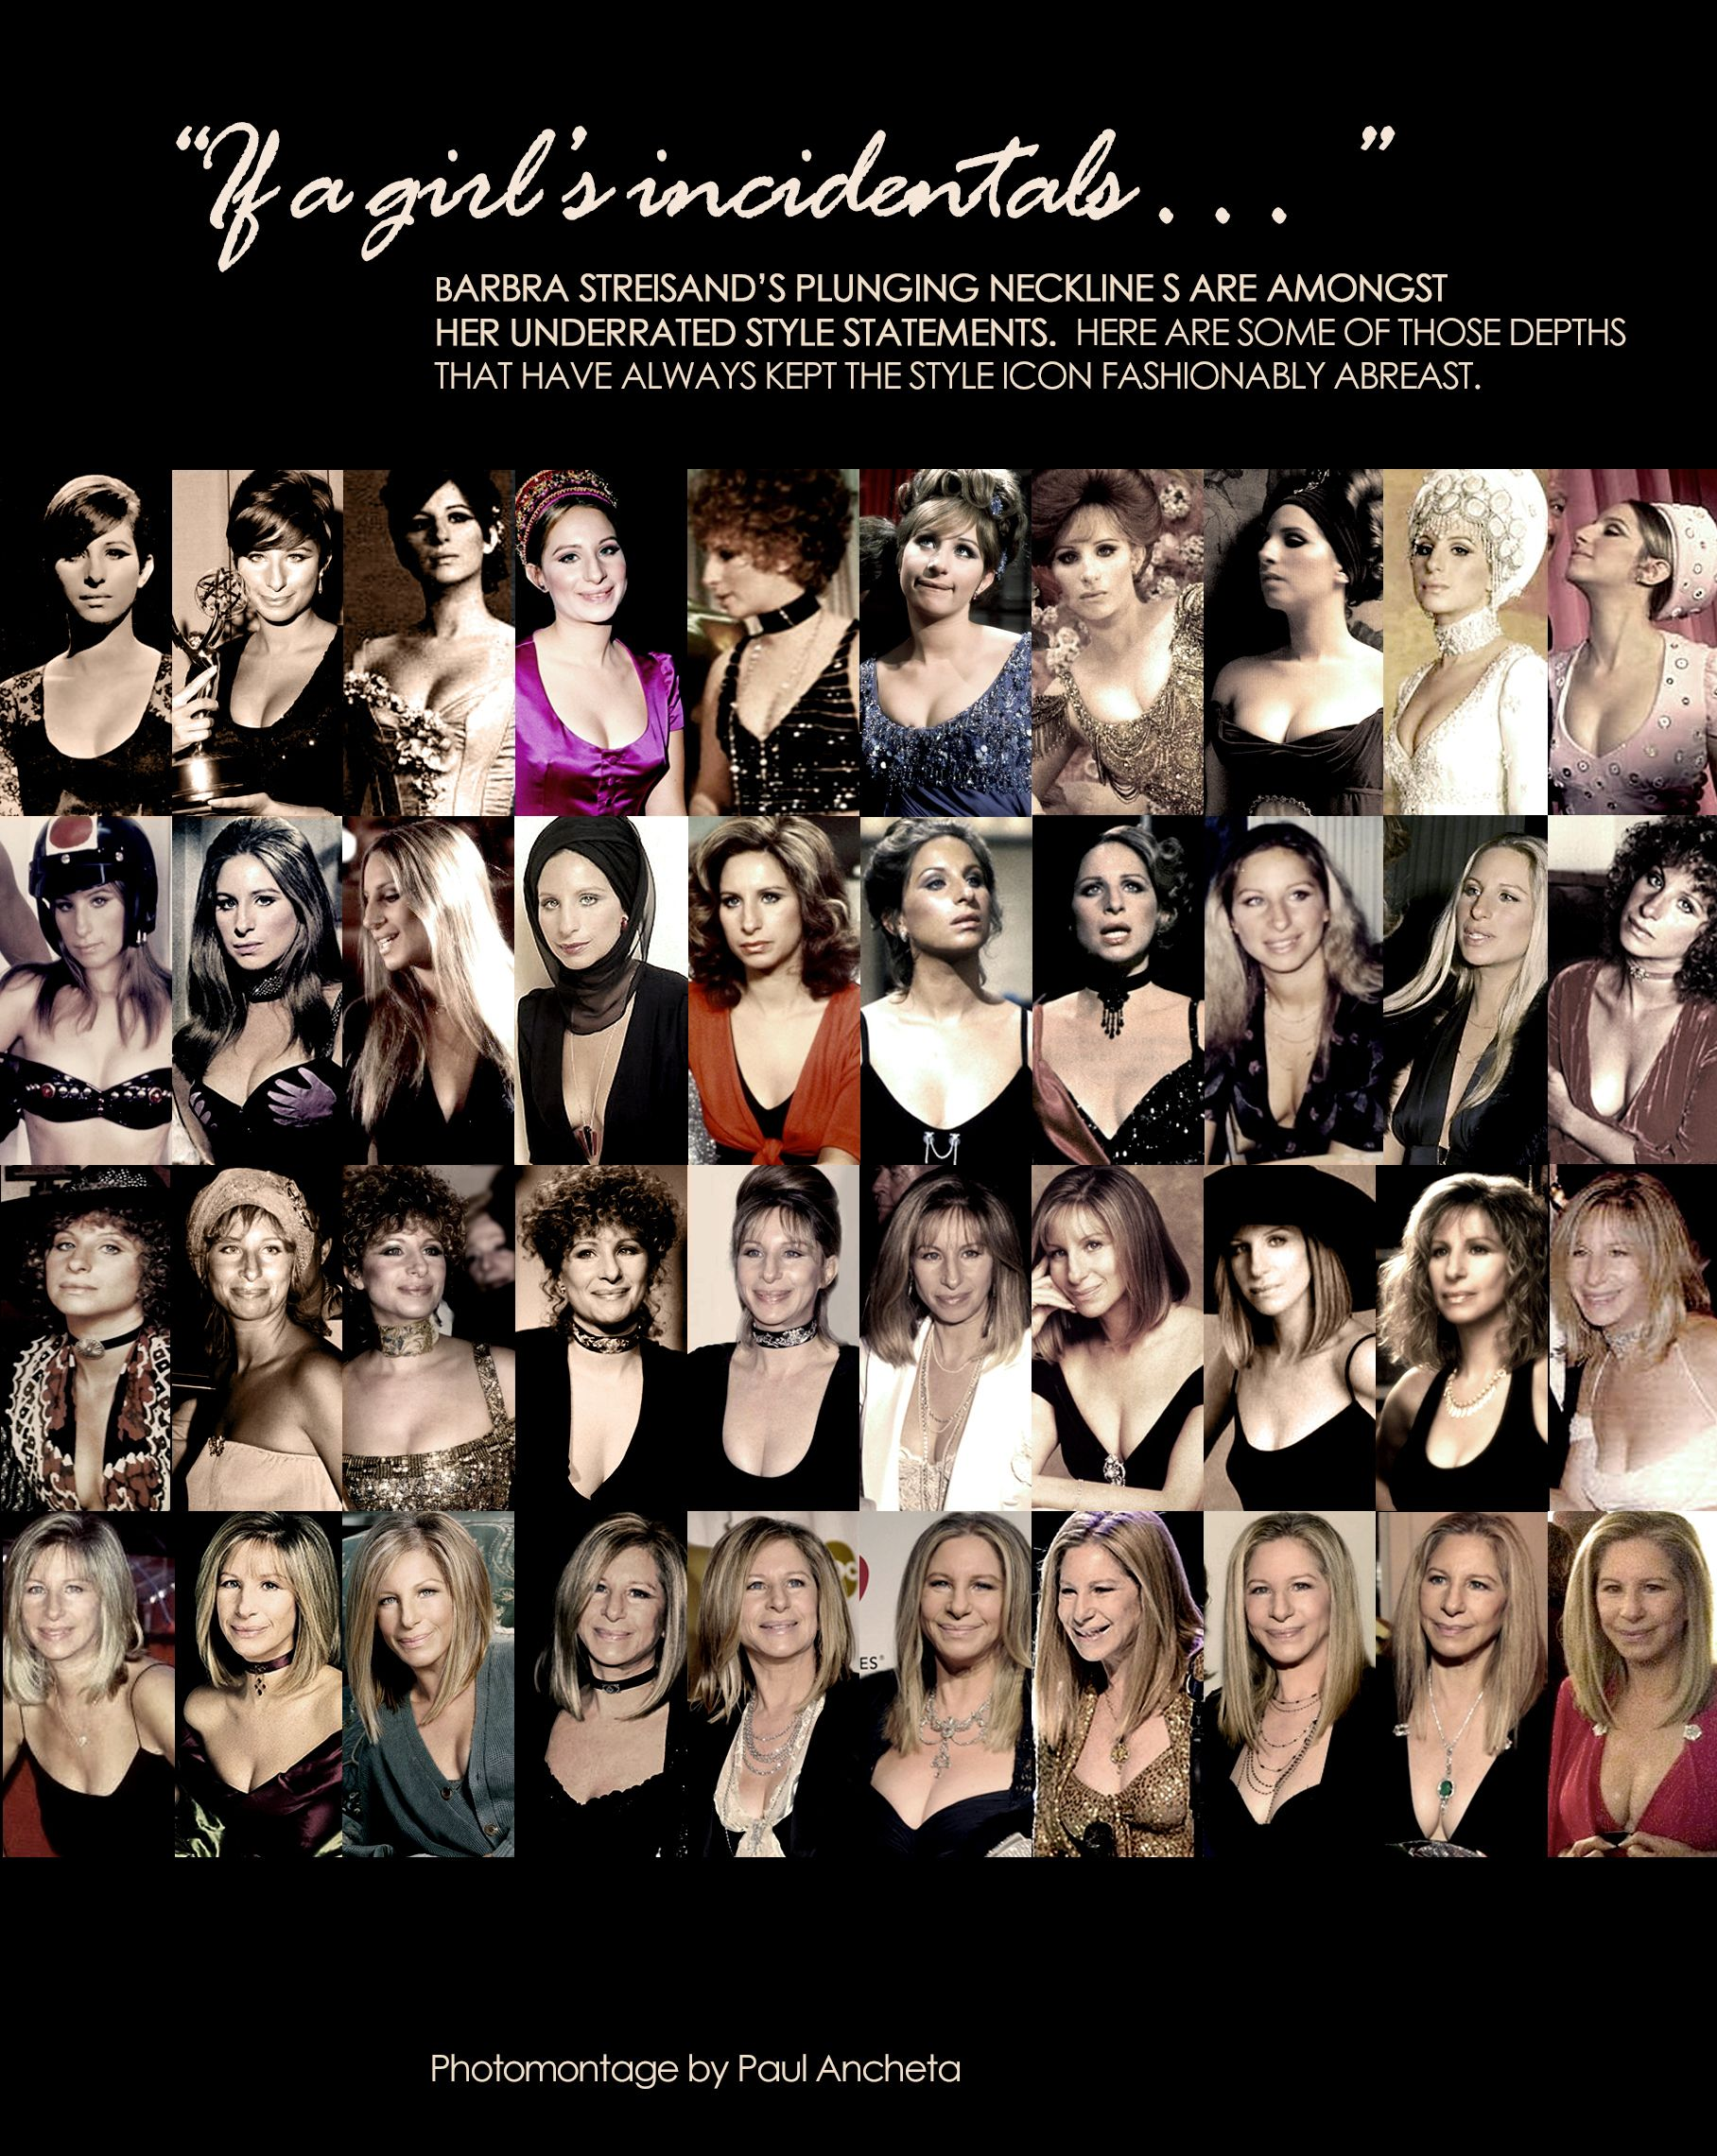 Barbra Streisand's fashionable plunge through the years.